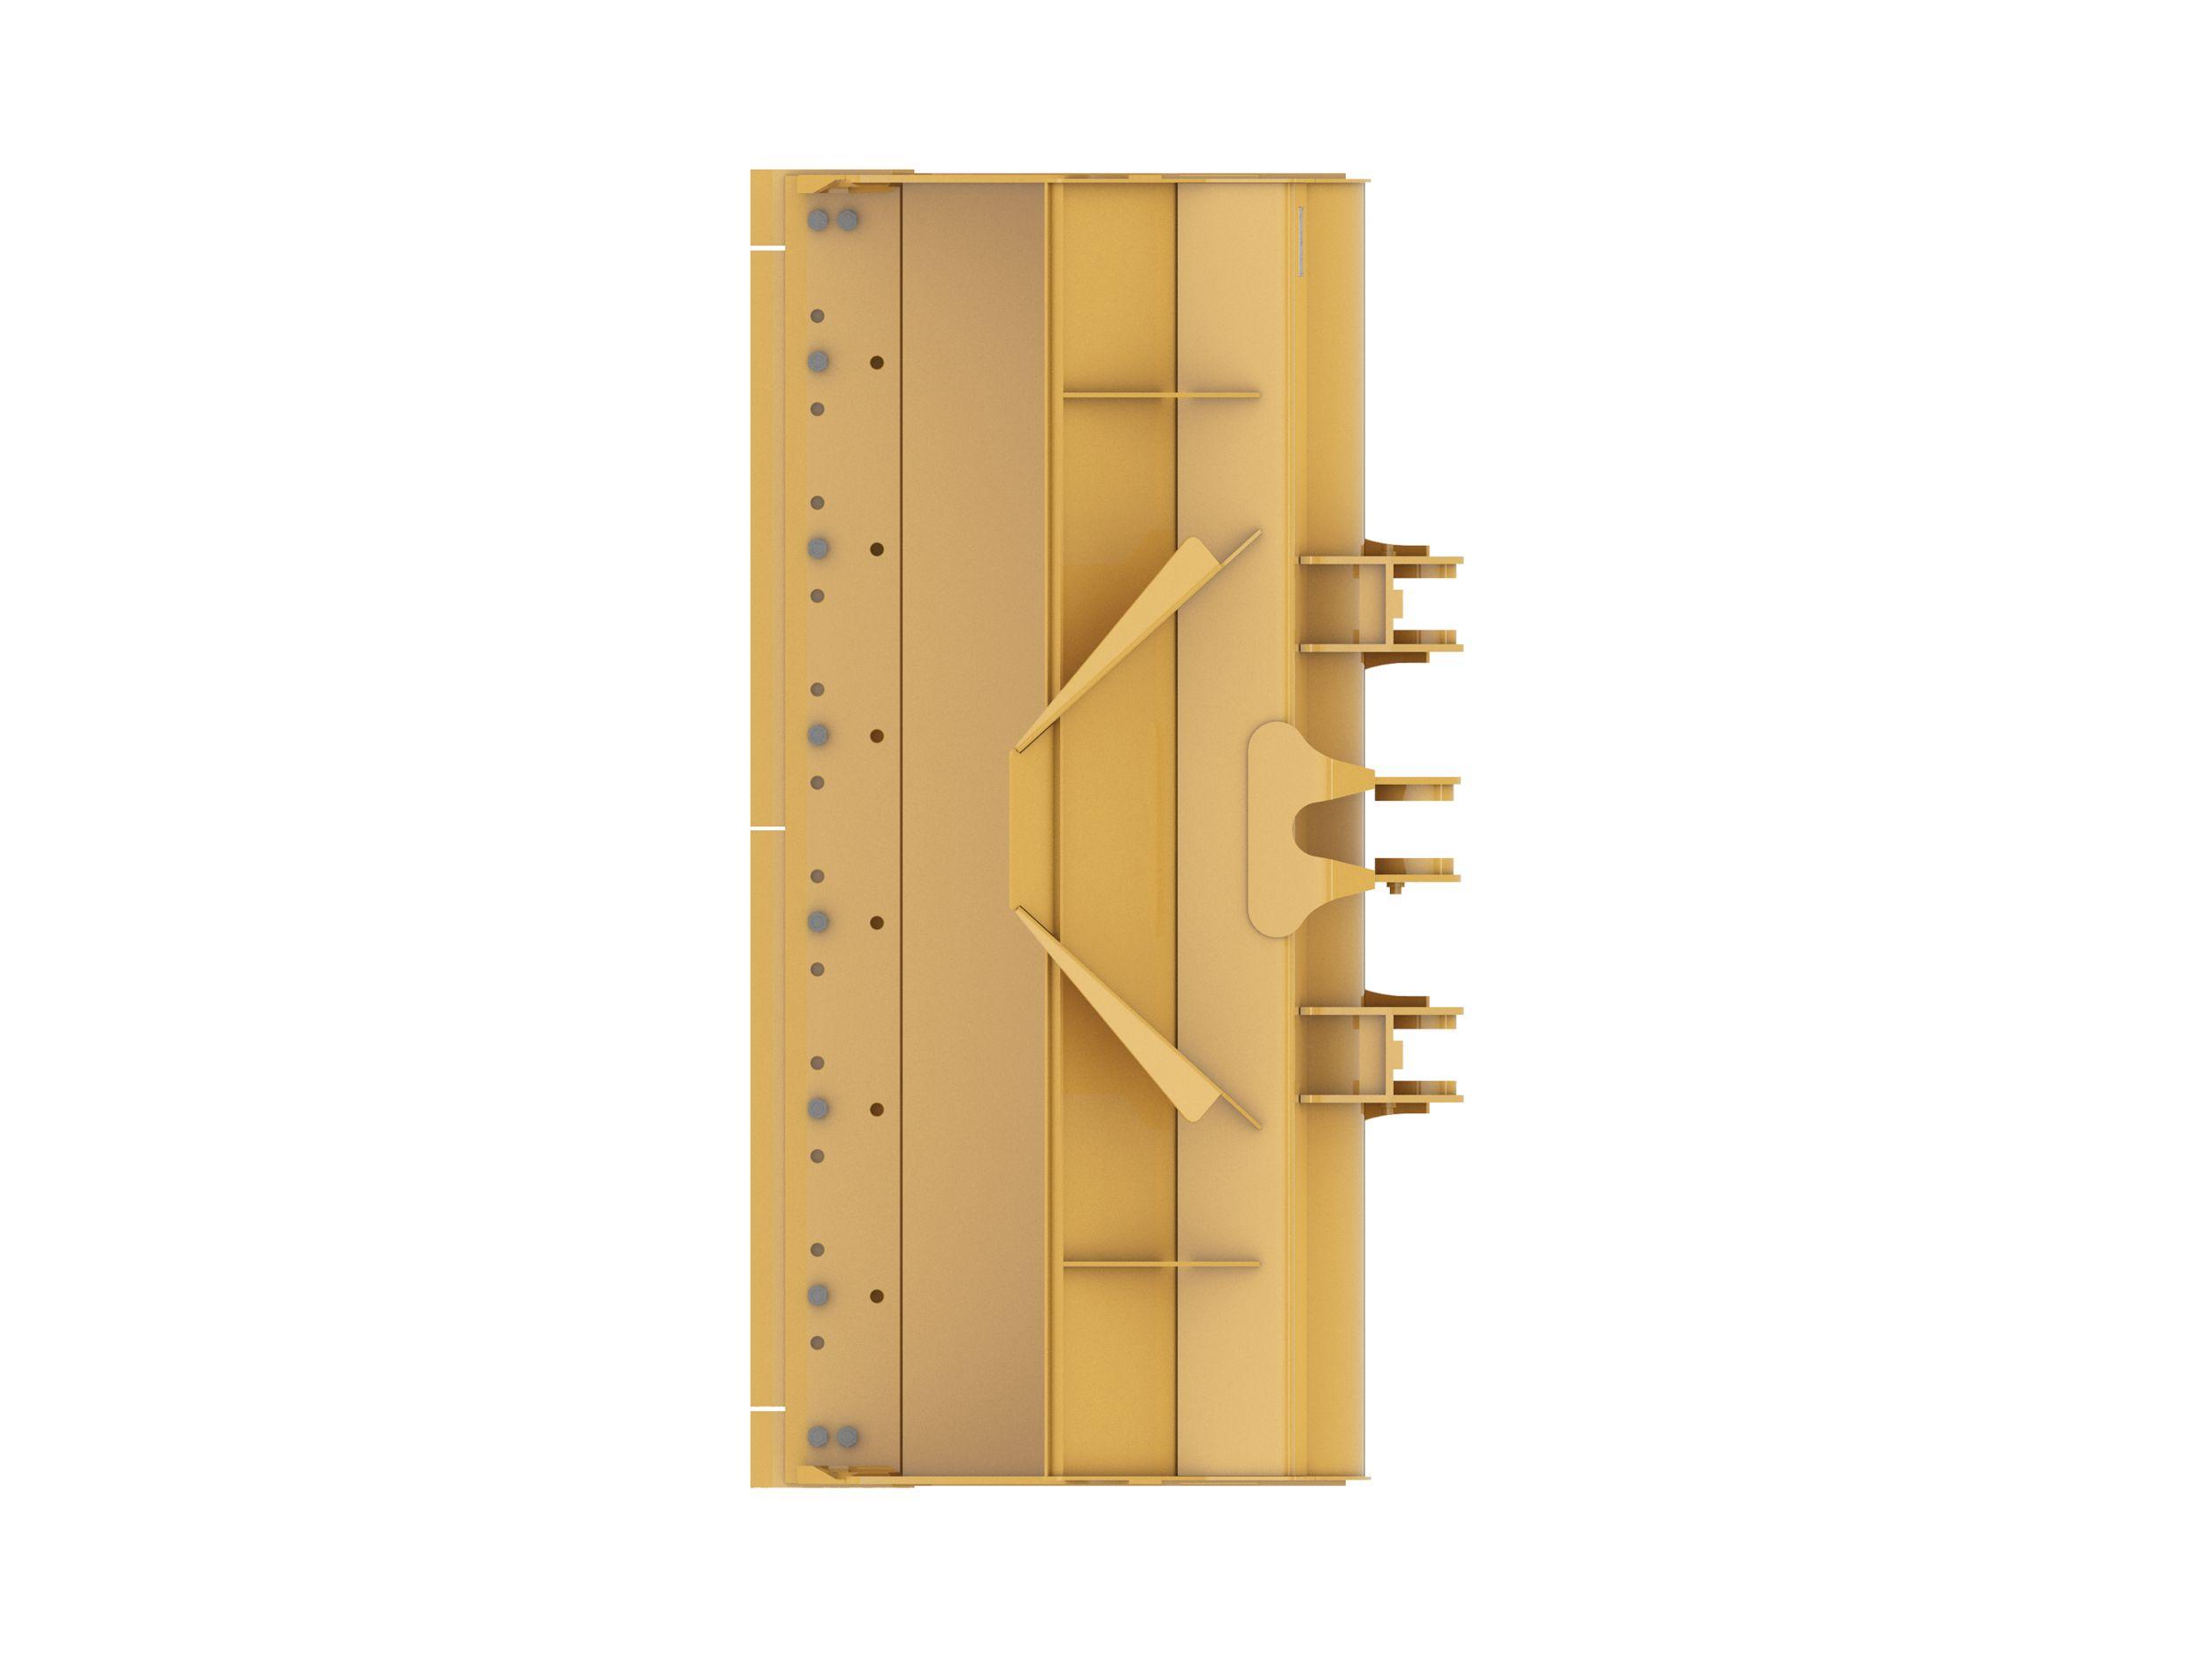 Gallery 3.5 m3 (4.5 yd3), Pin On, Bolt-On Cutting Edge